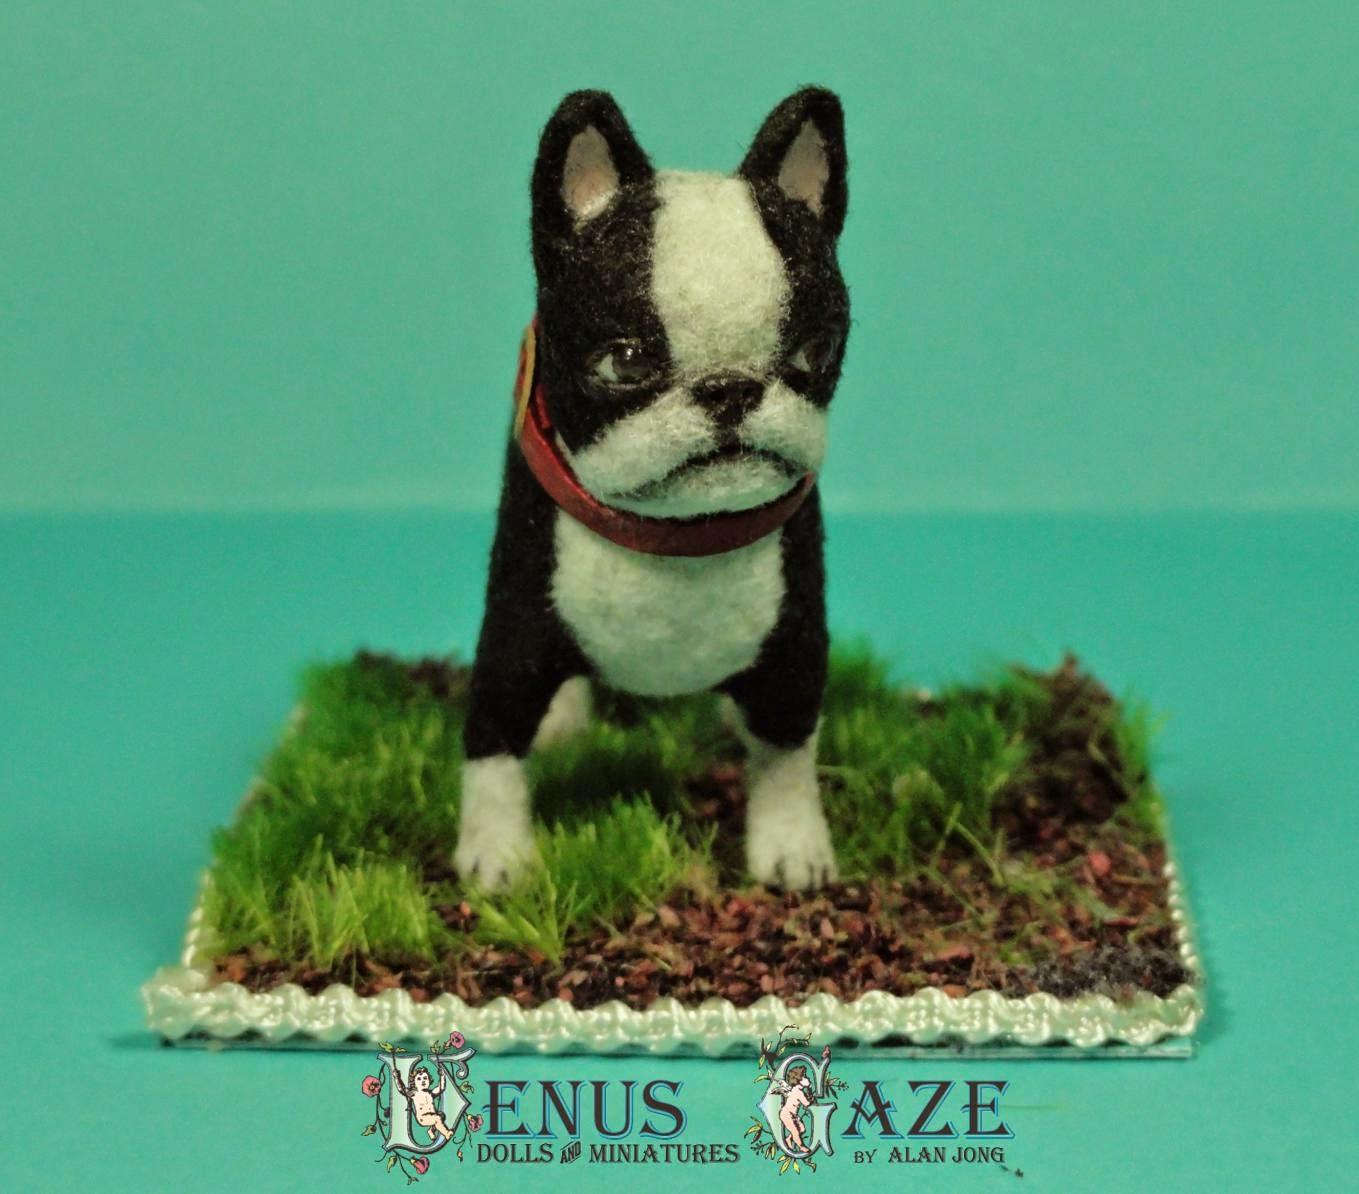 Venus Gaze Miniature Doll Art: Tiny Stare #1 Bostion Terrier